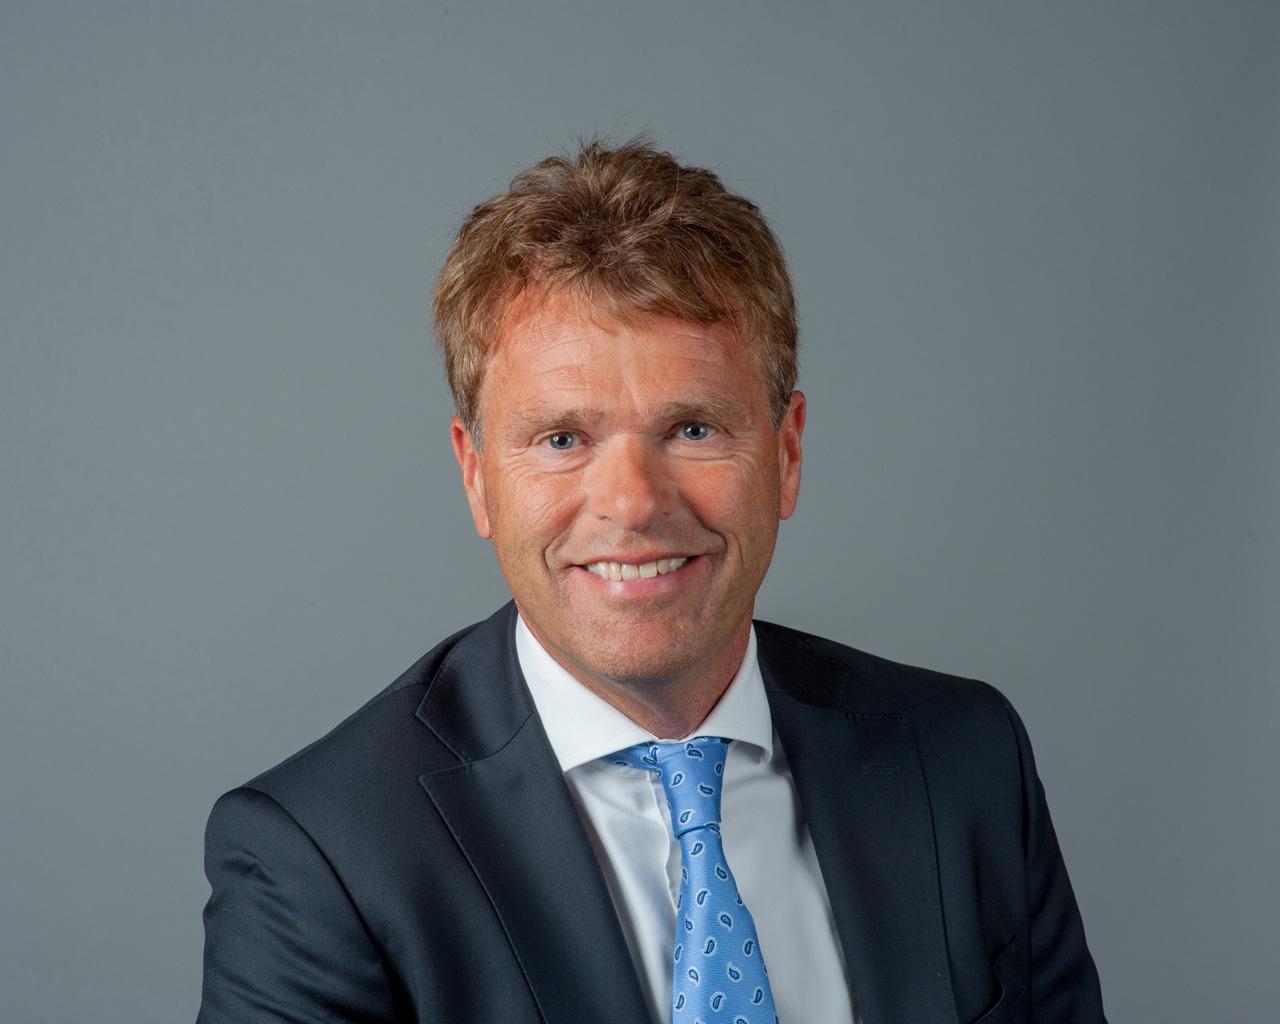 Jaco de Vries